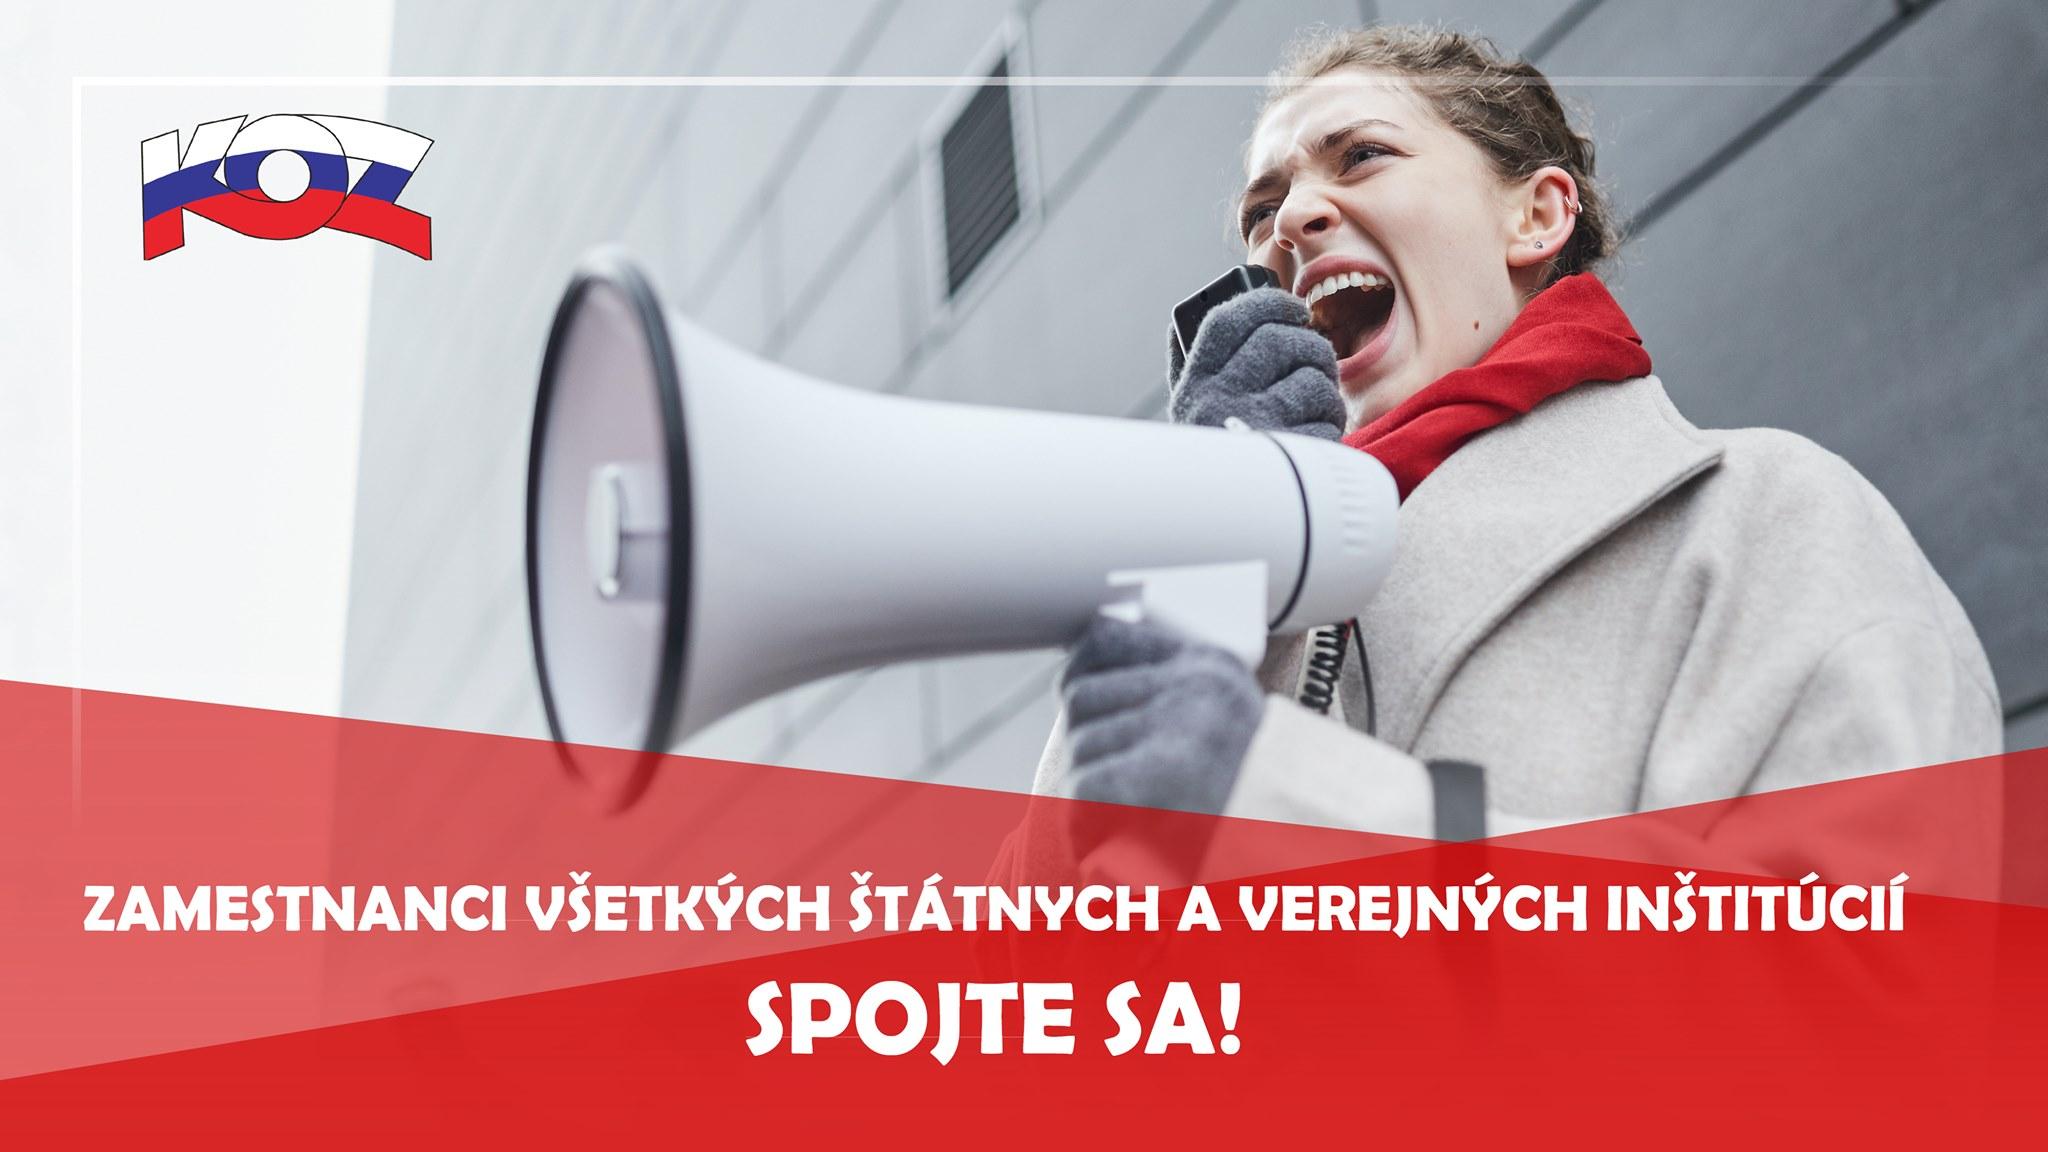 koz_kolektivne_zmluvy.jpg